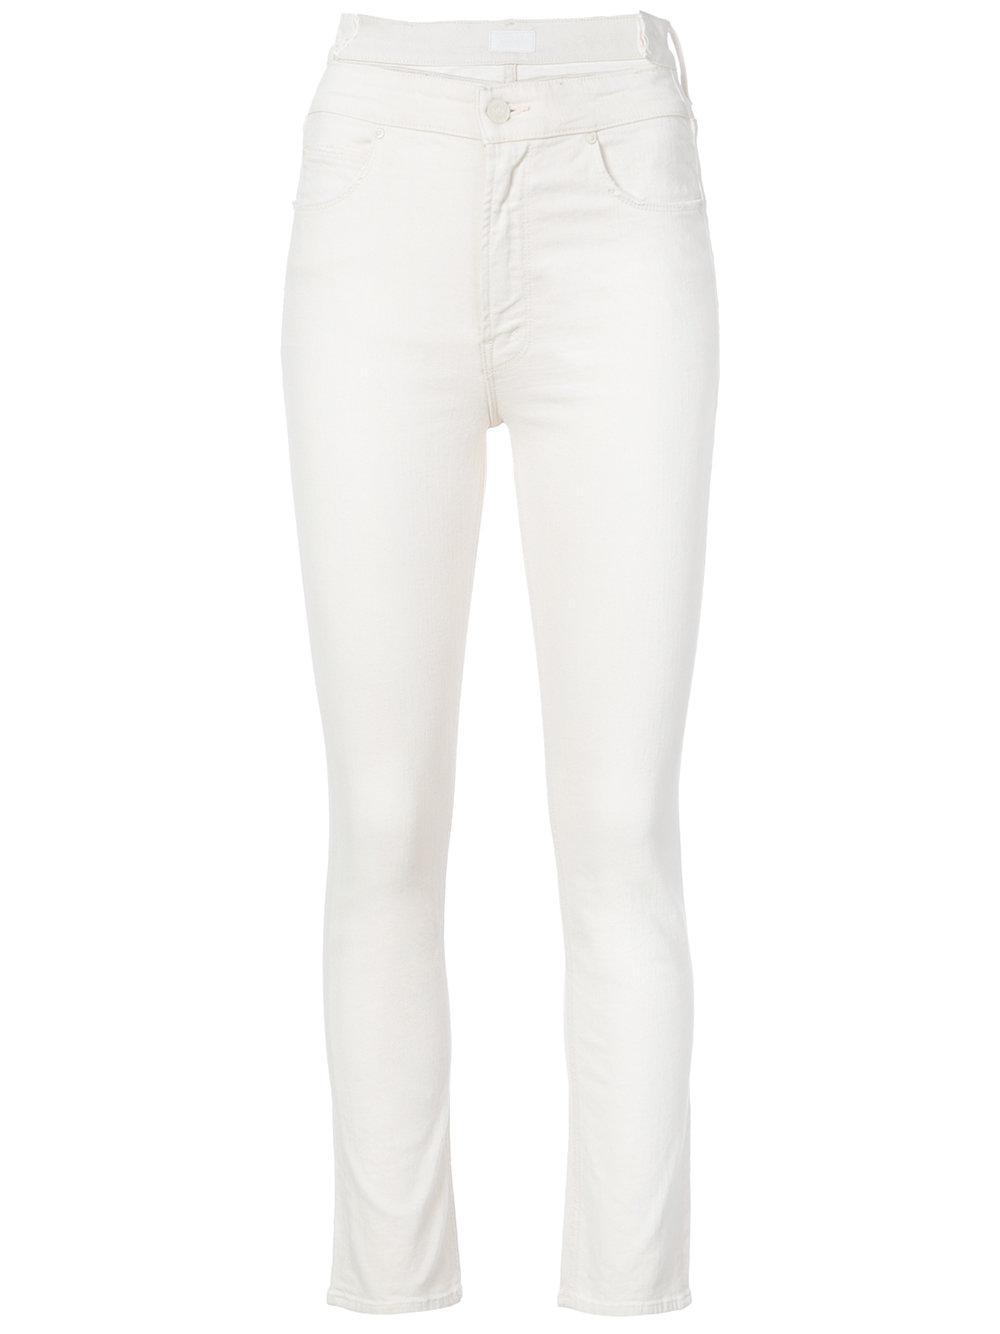 High Waist Skinny Jean Item # 1396-544